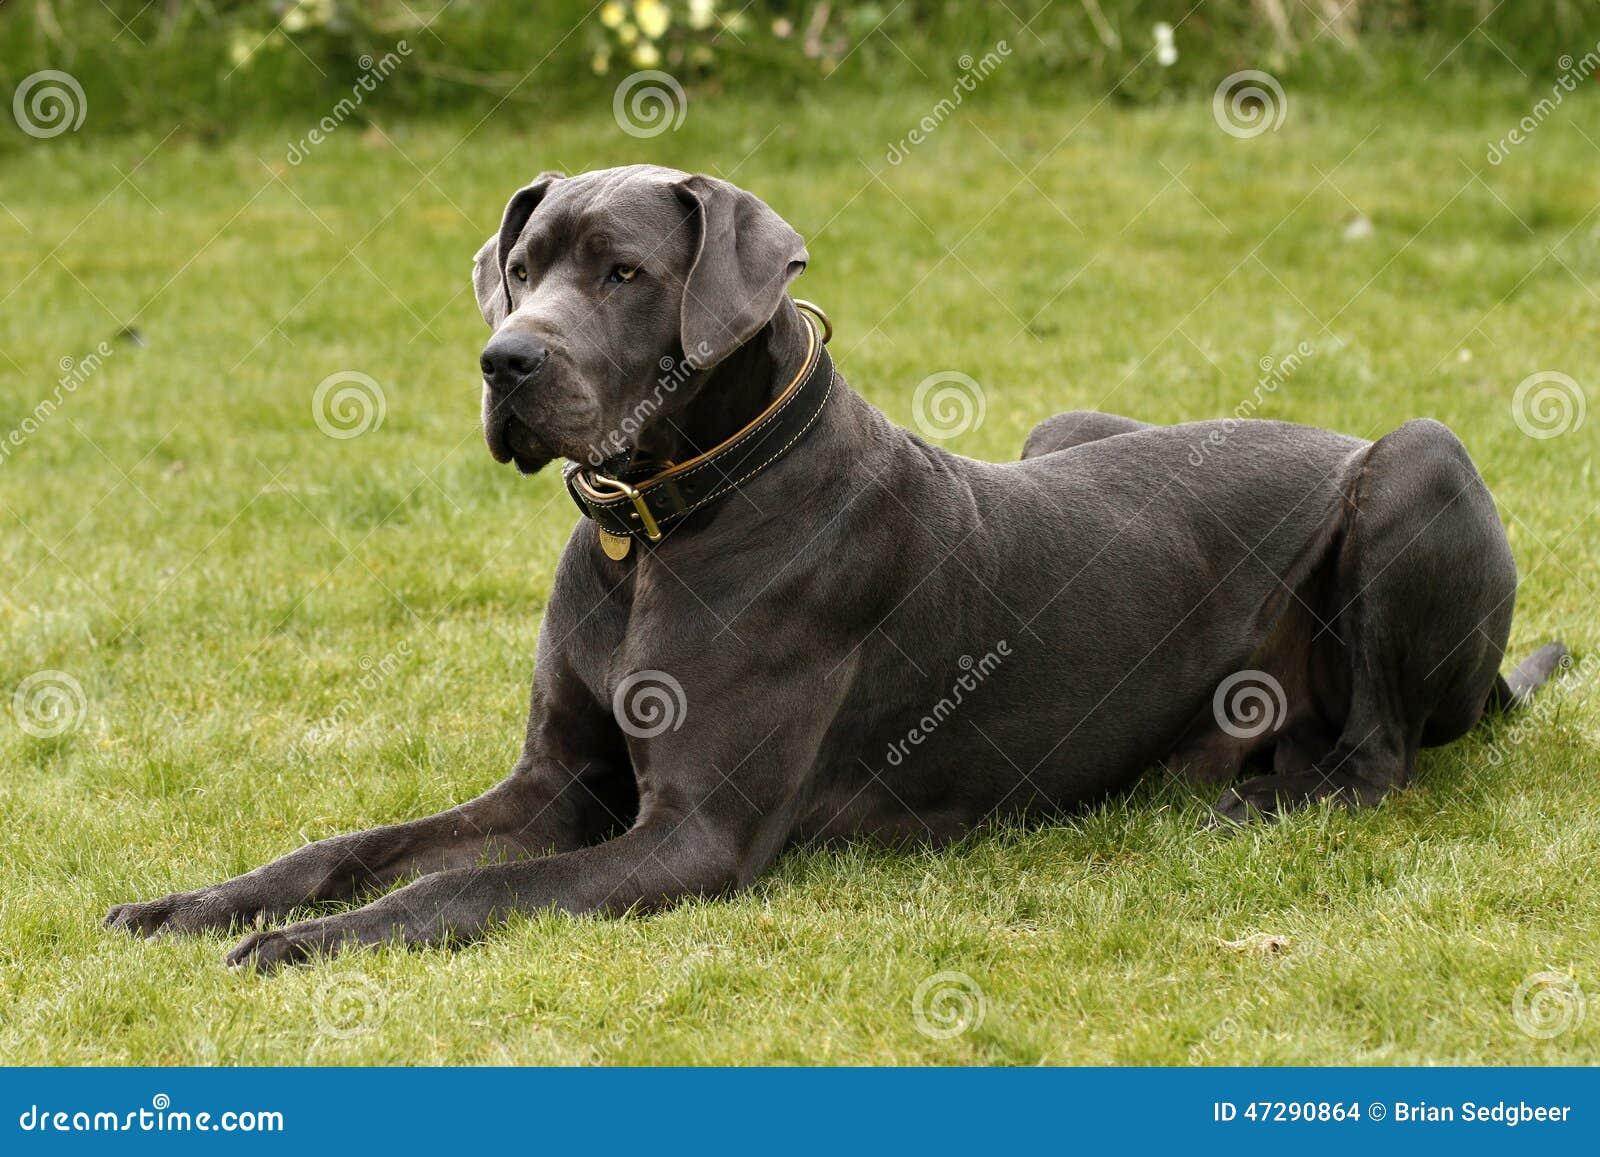 A Great Dane Dog Stock Photo Image Of Biggest Dane 47290864